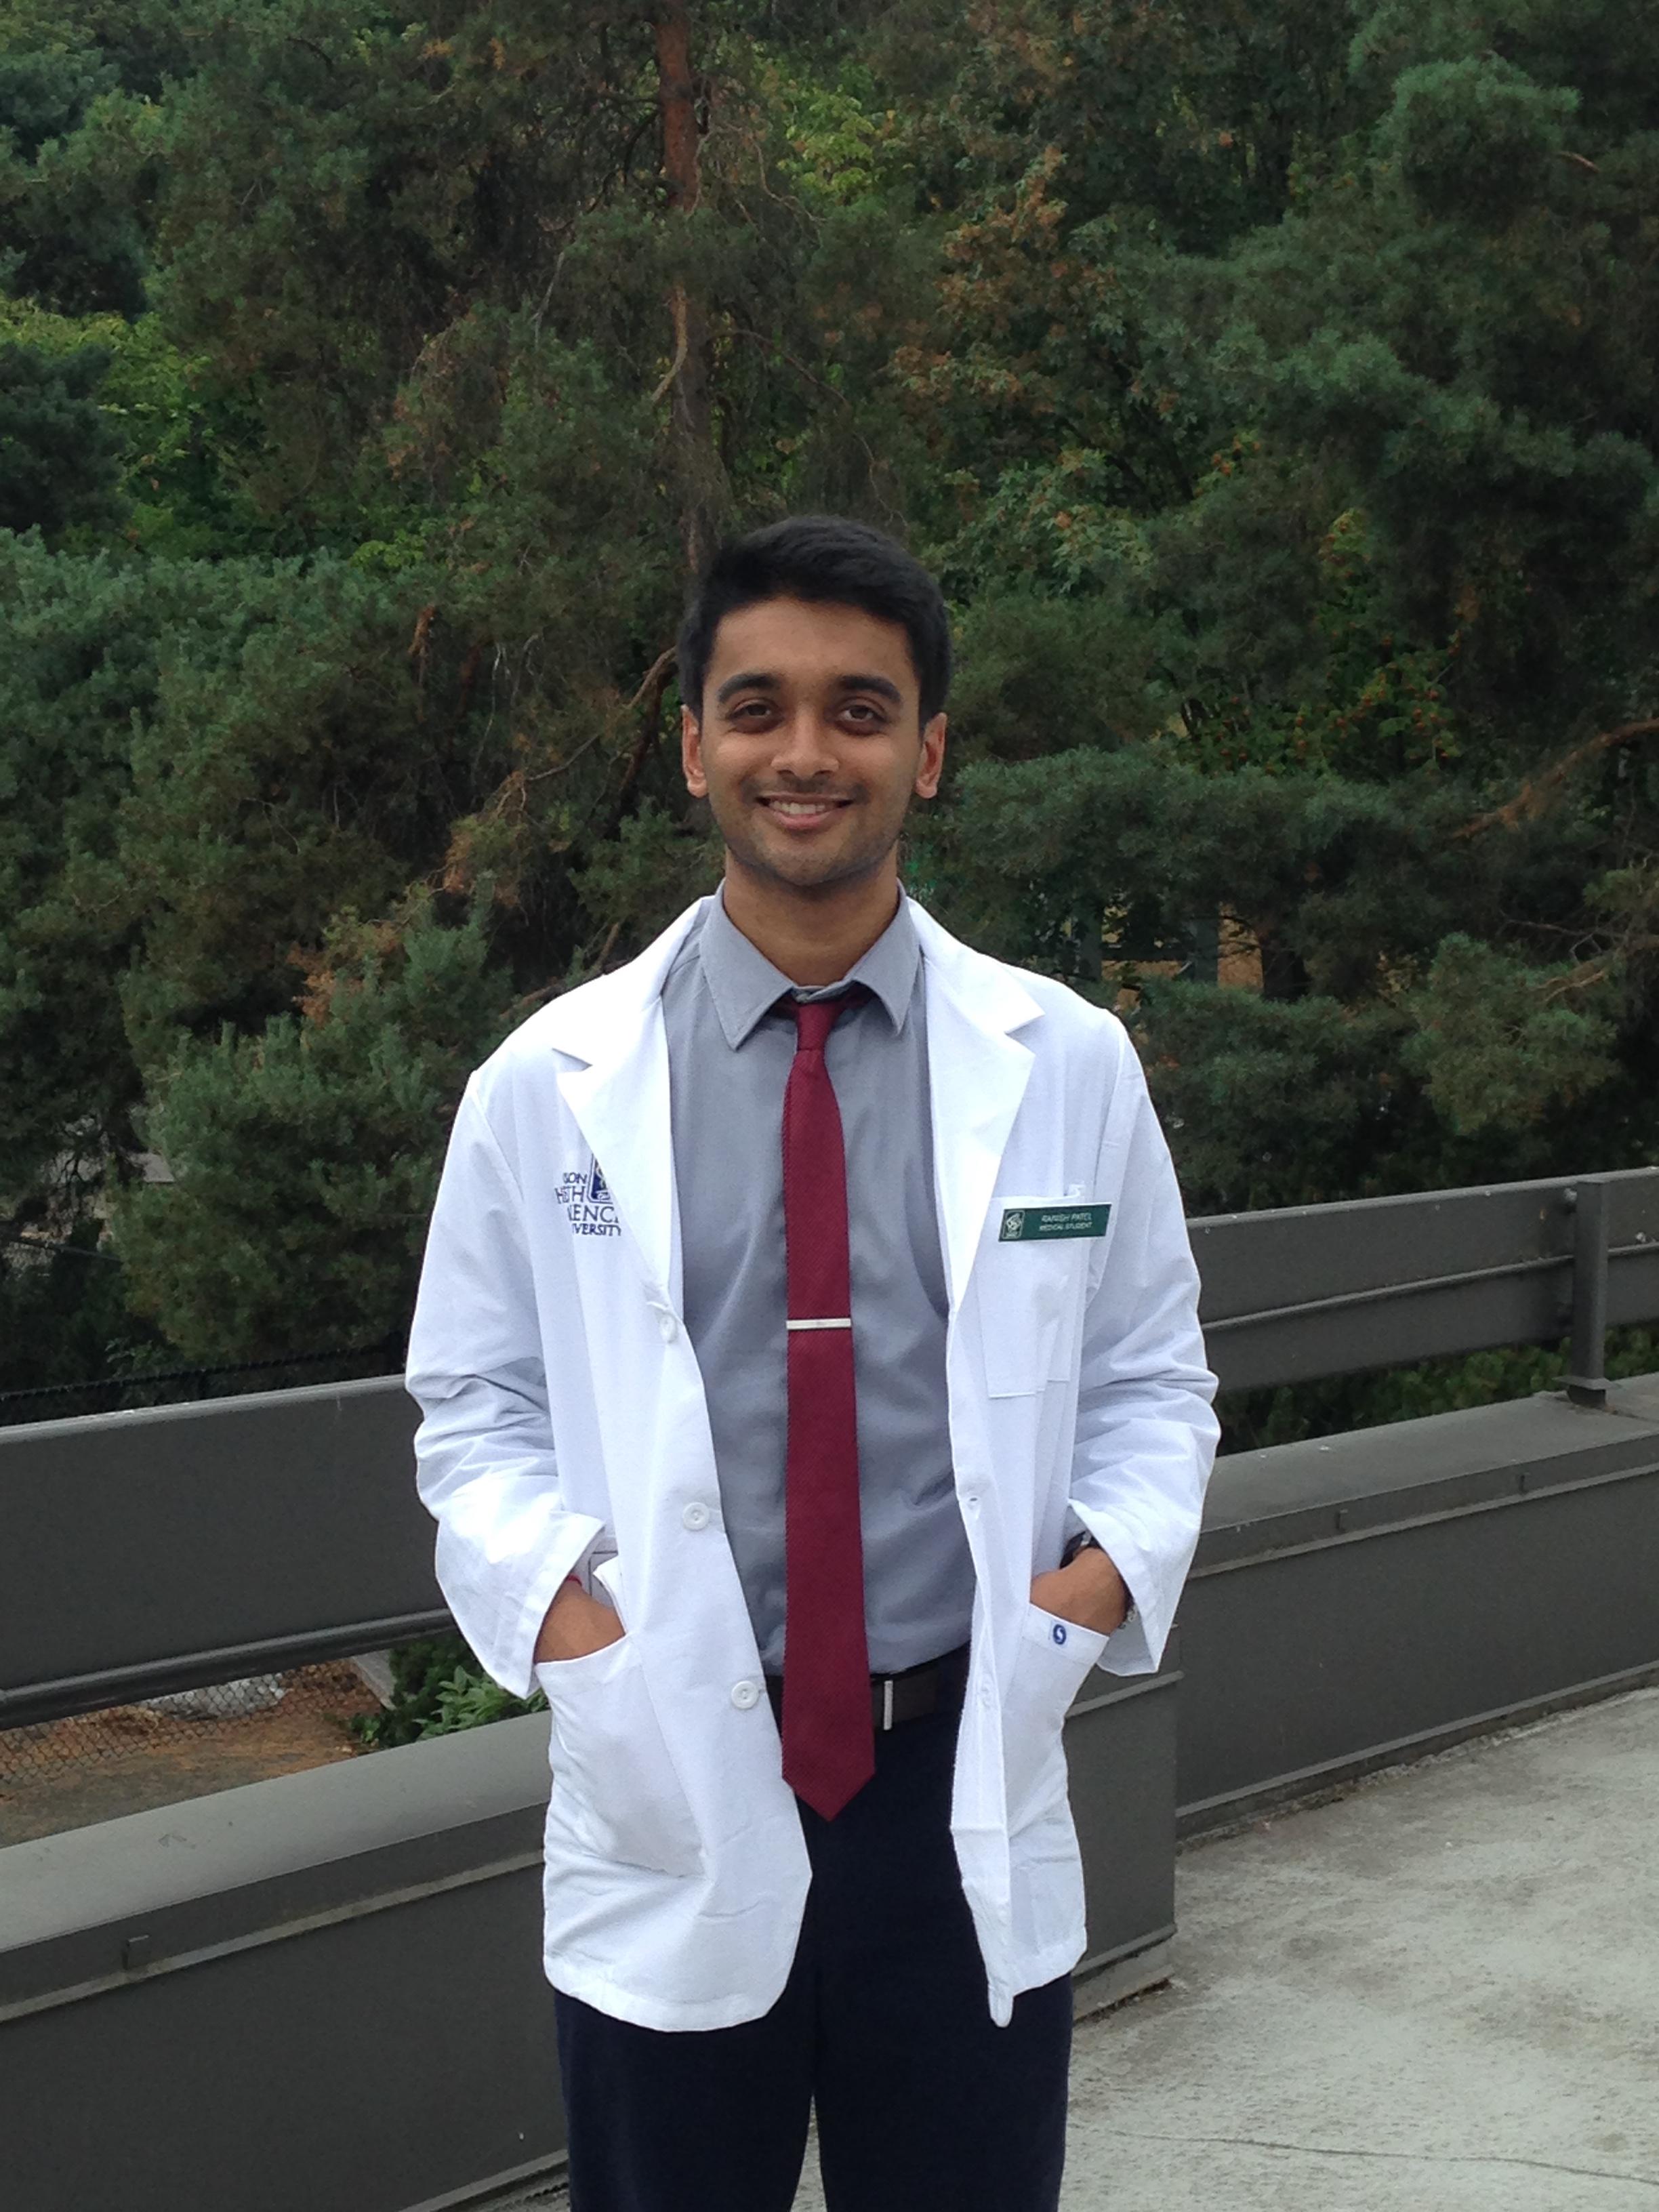 Ranish Patel